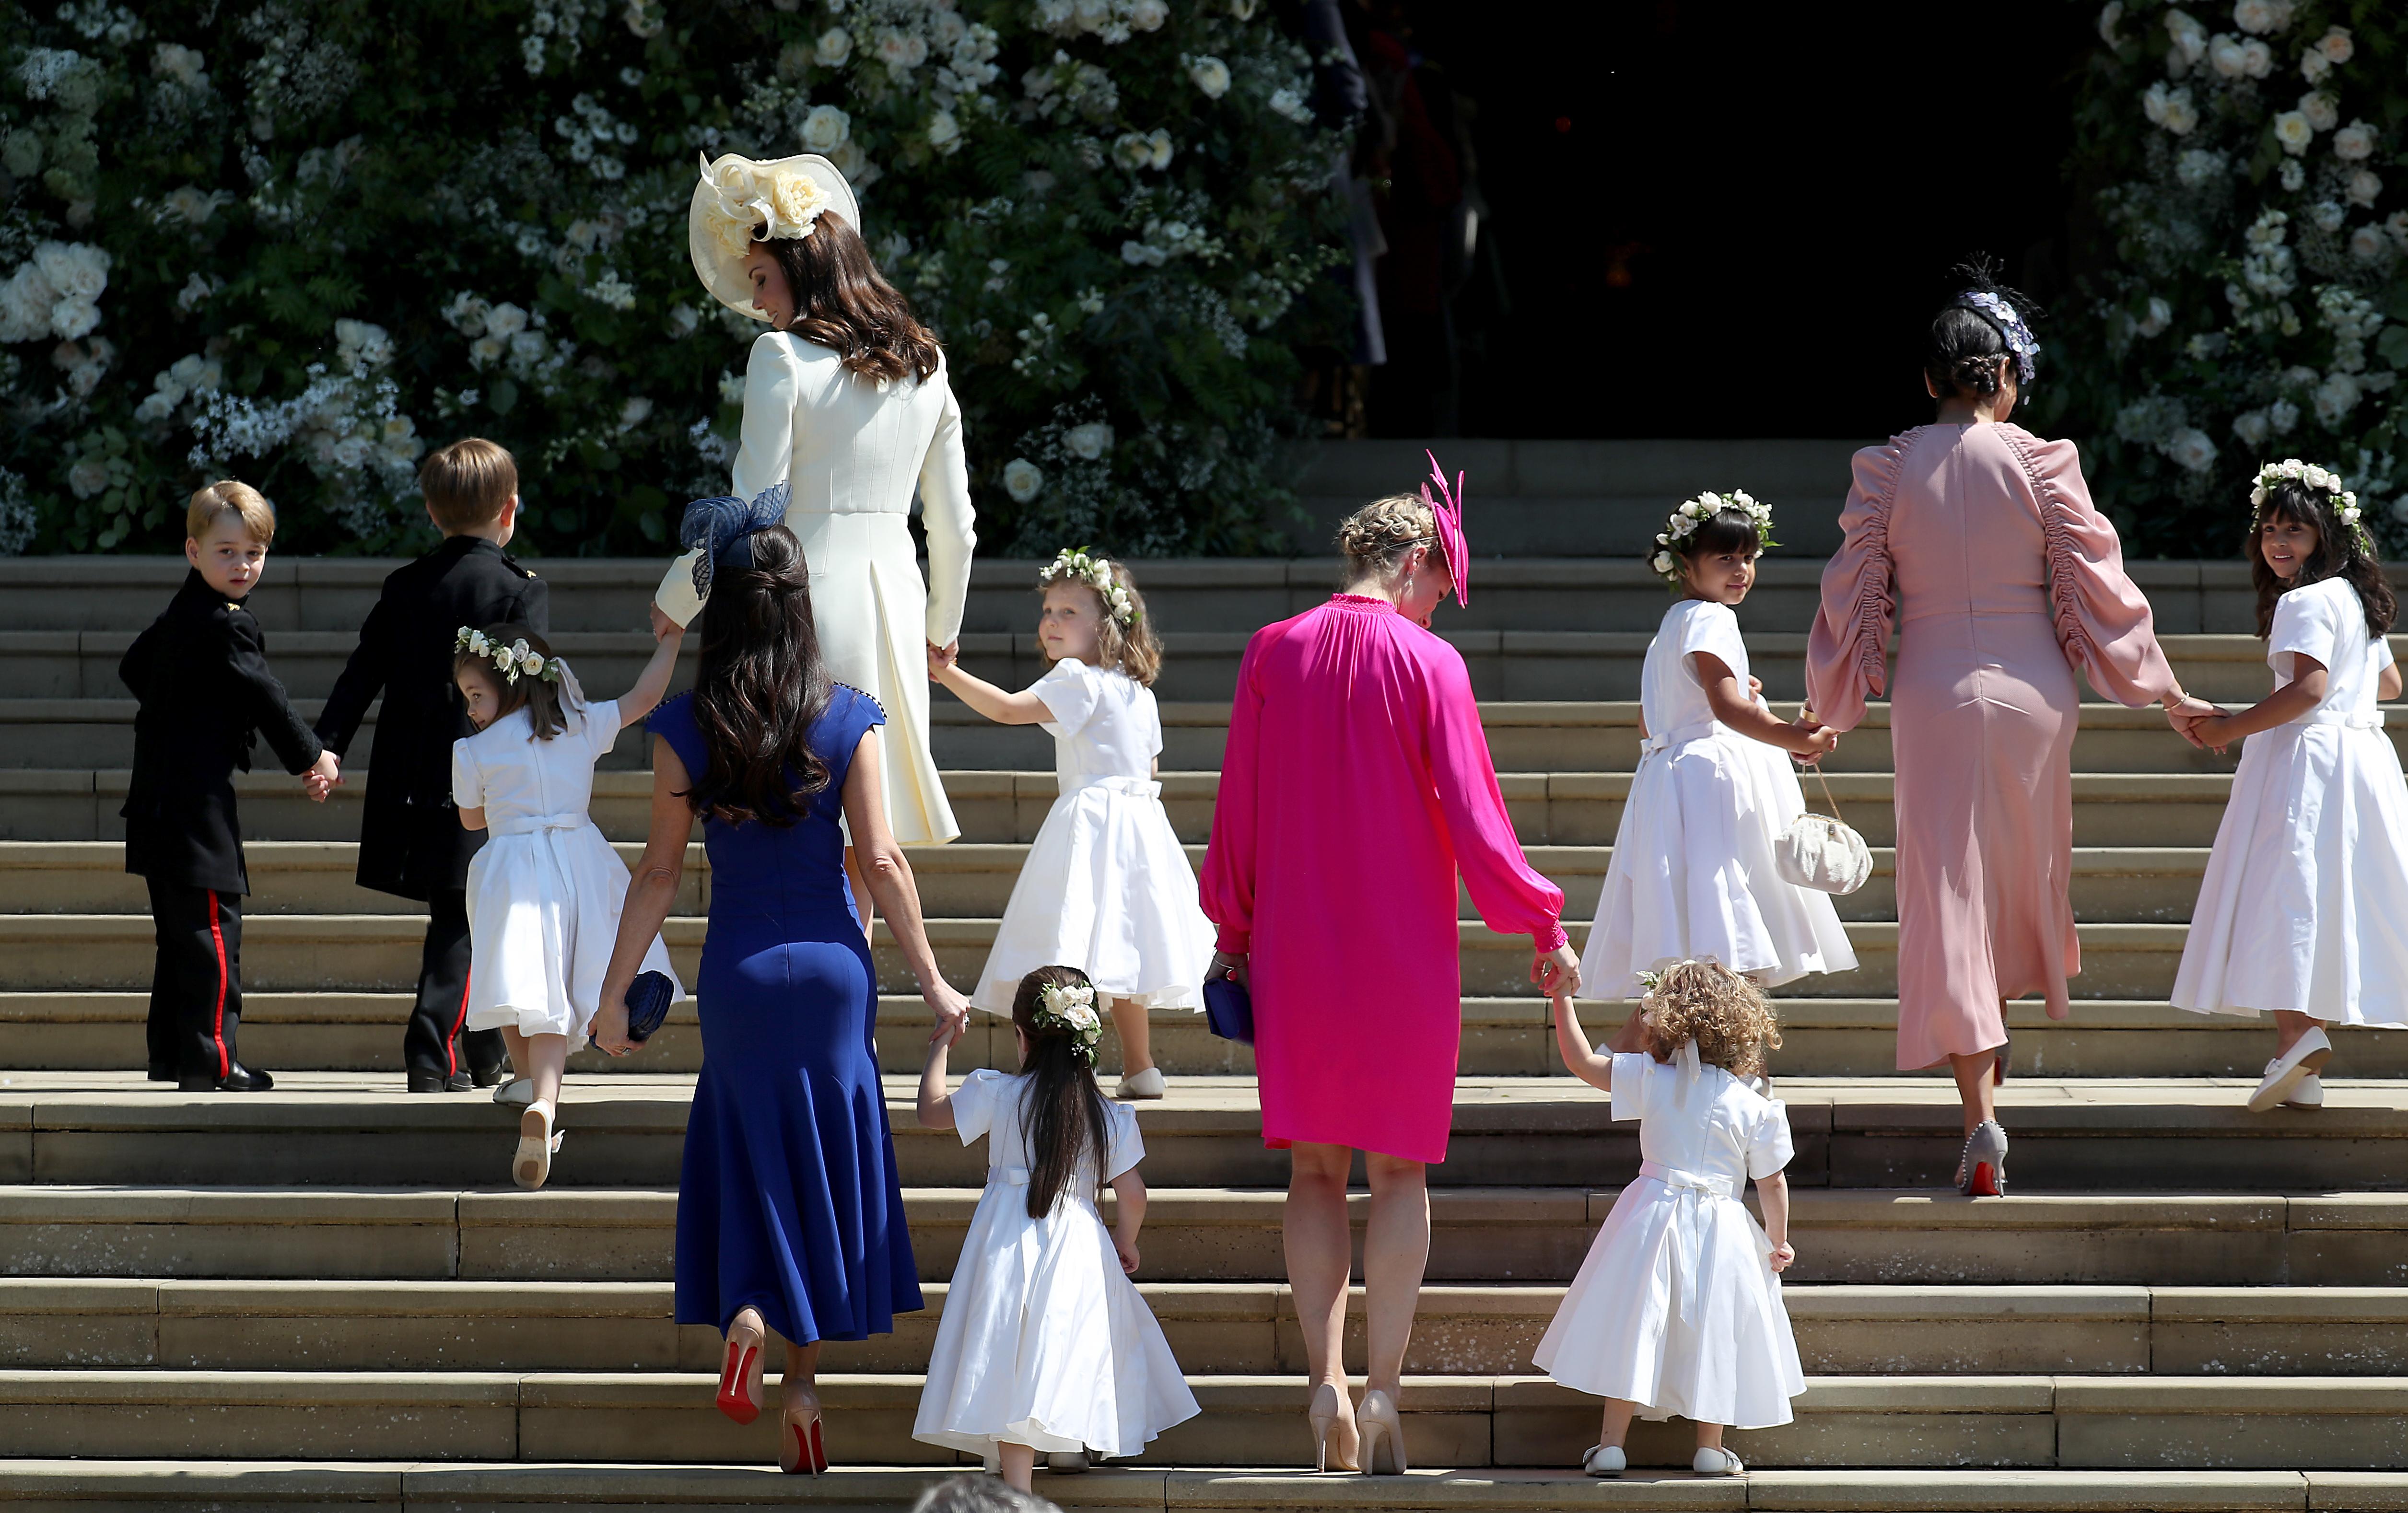 Royal bridesmaids pageboys